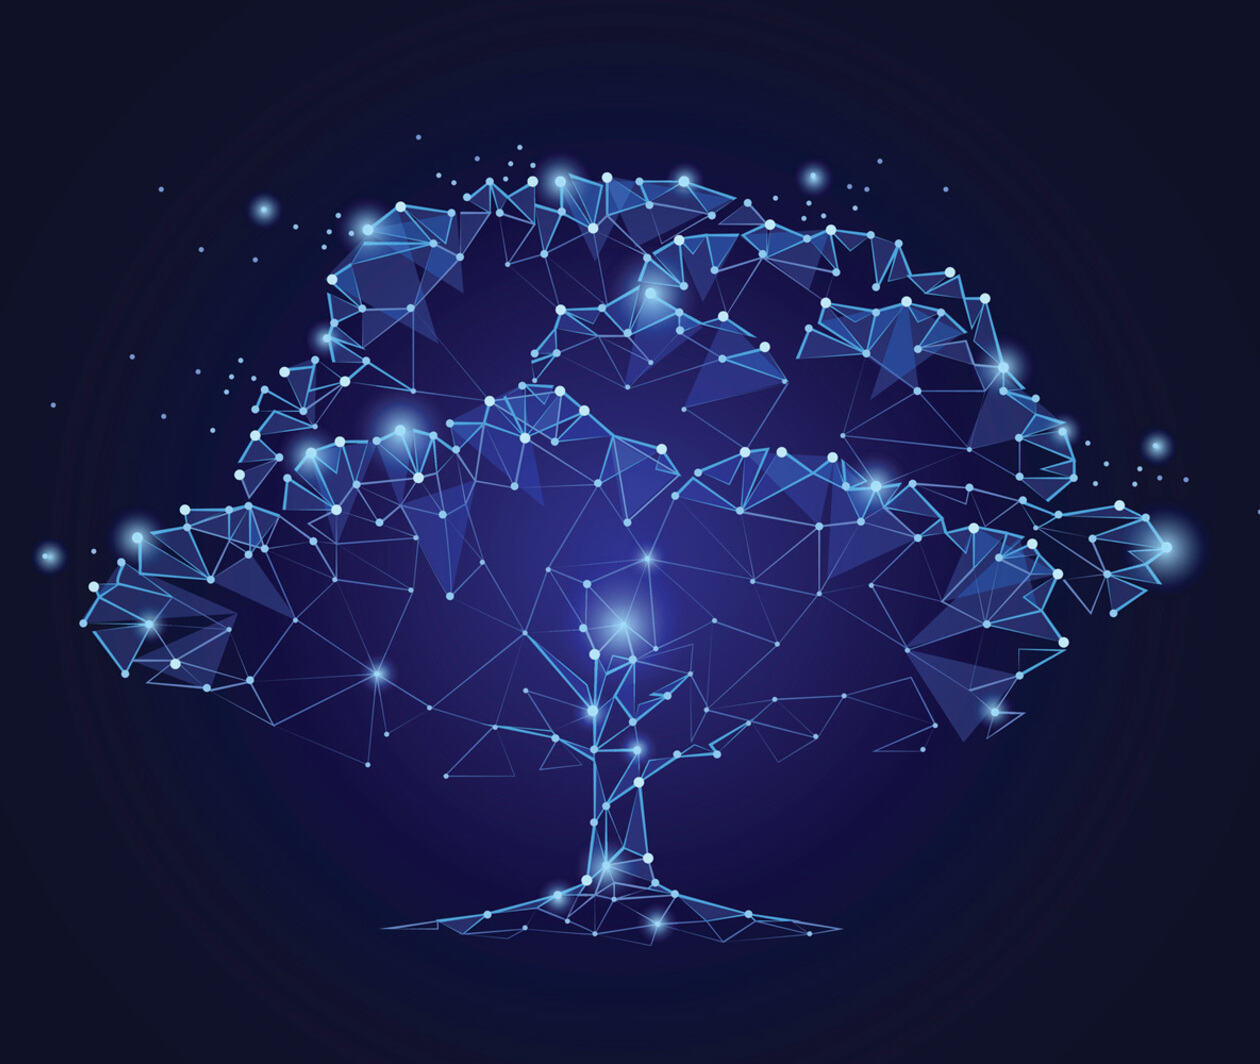 EEE726.5 Innovating Digital Learning: Digital Identity Meets Transformative Practice